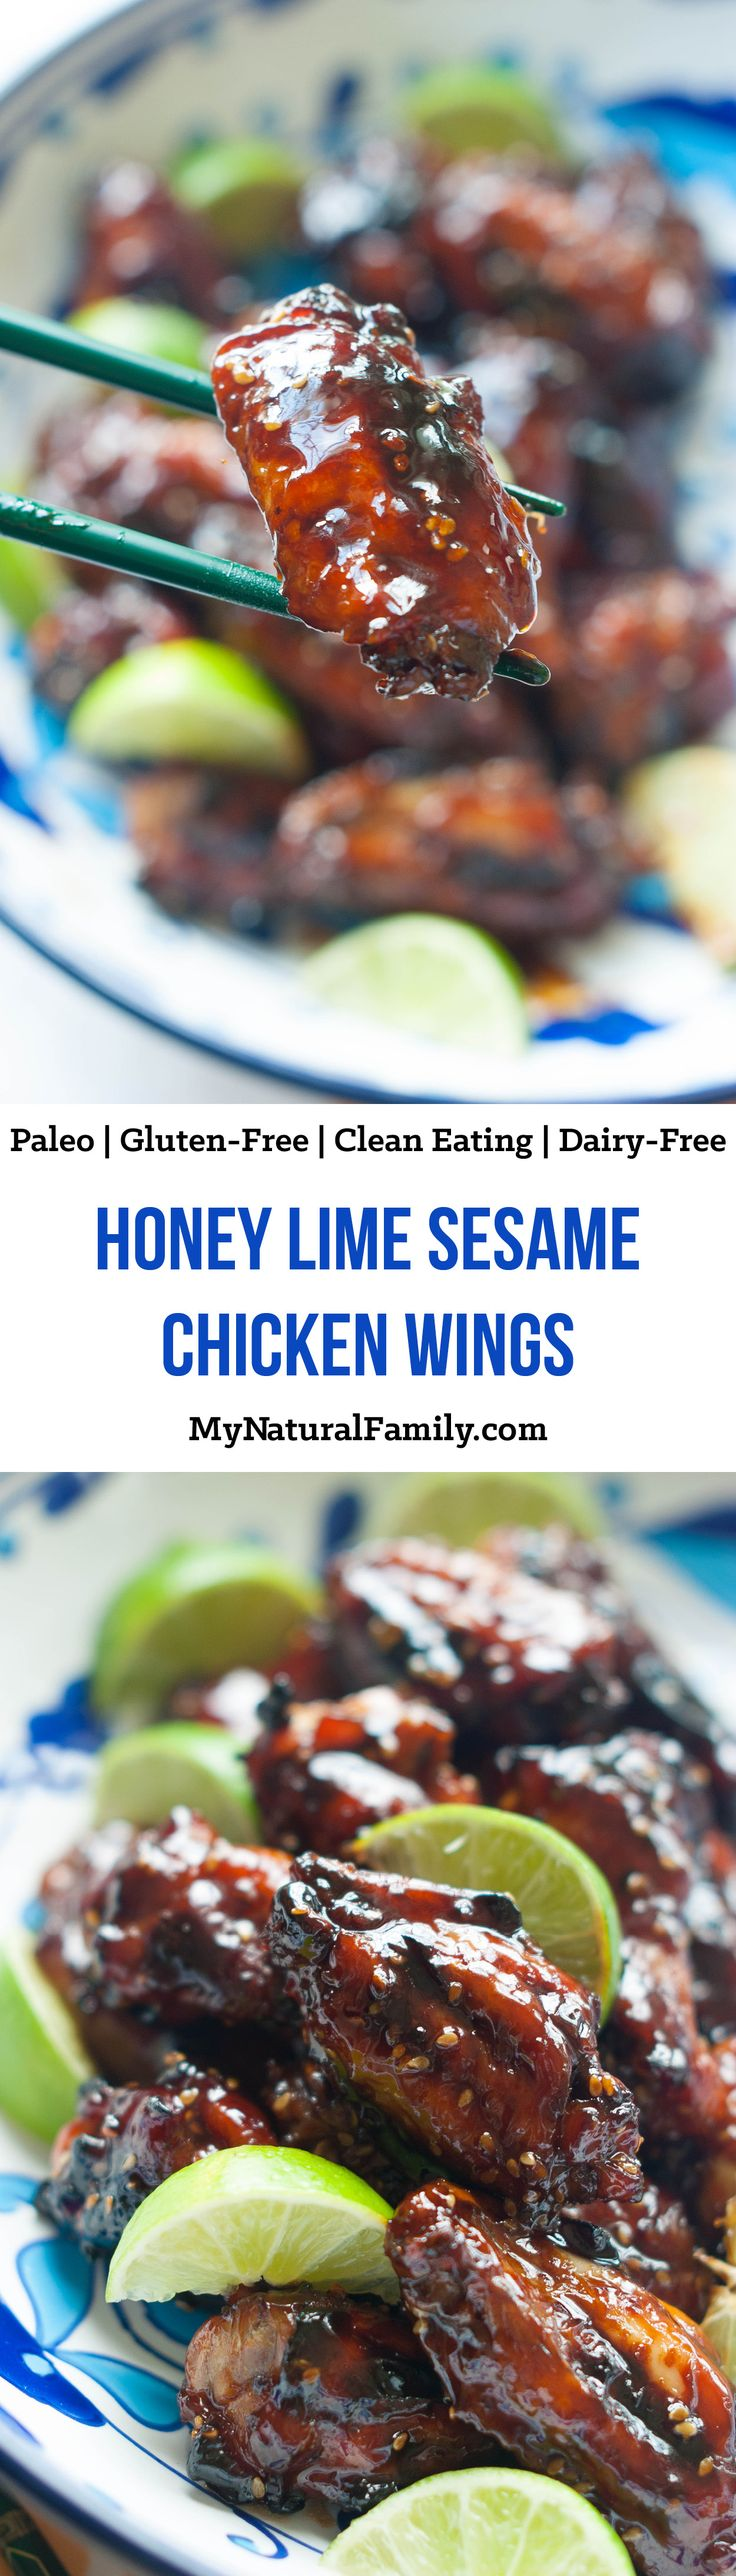 Honey Lime Sesame Chicken Wings Recipe {Paleo Gluten Free Clean Eating Dairy Free}